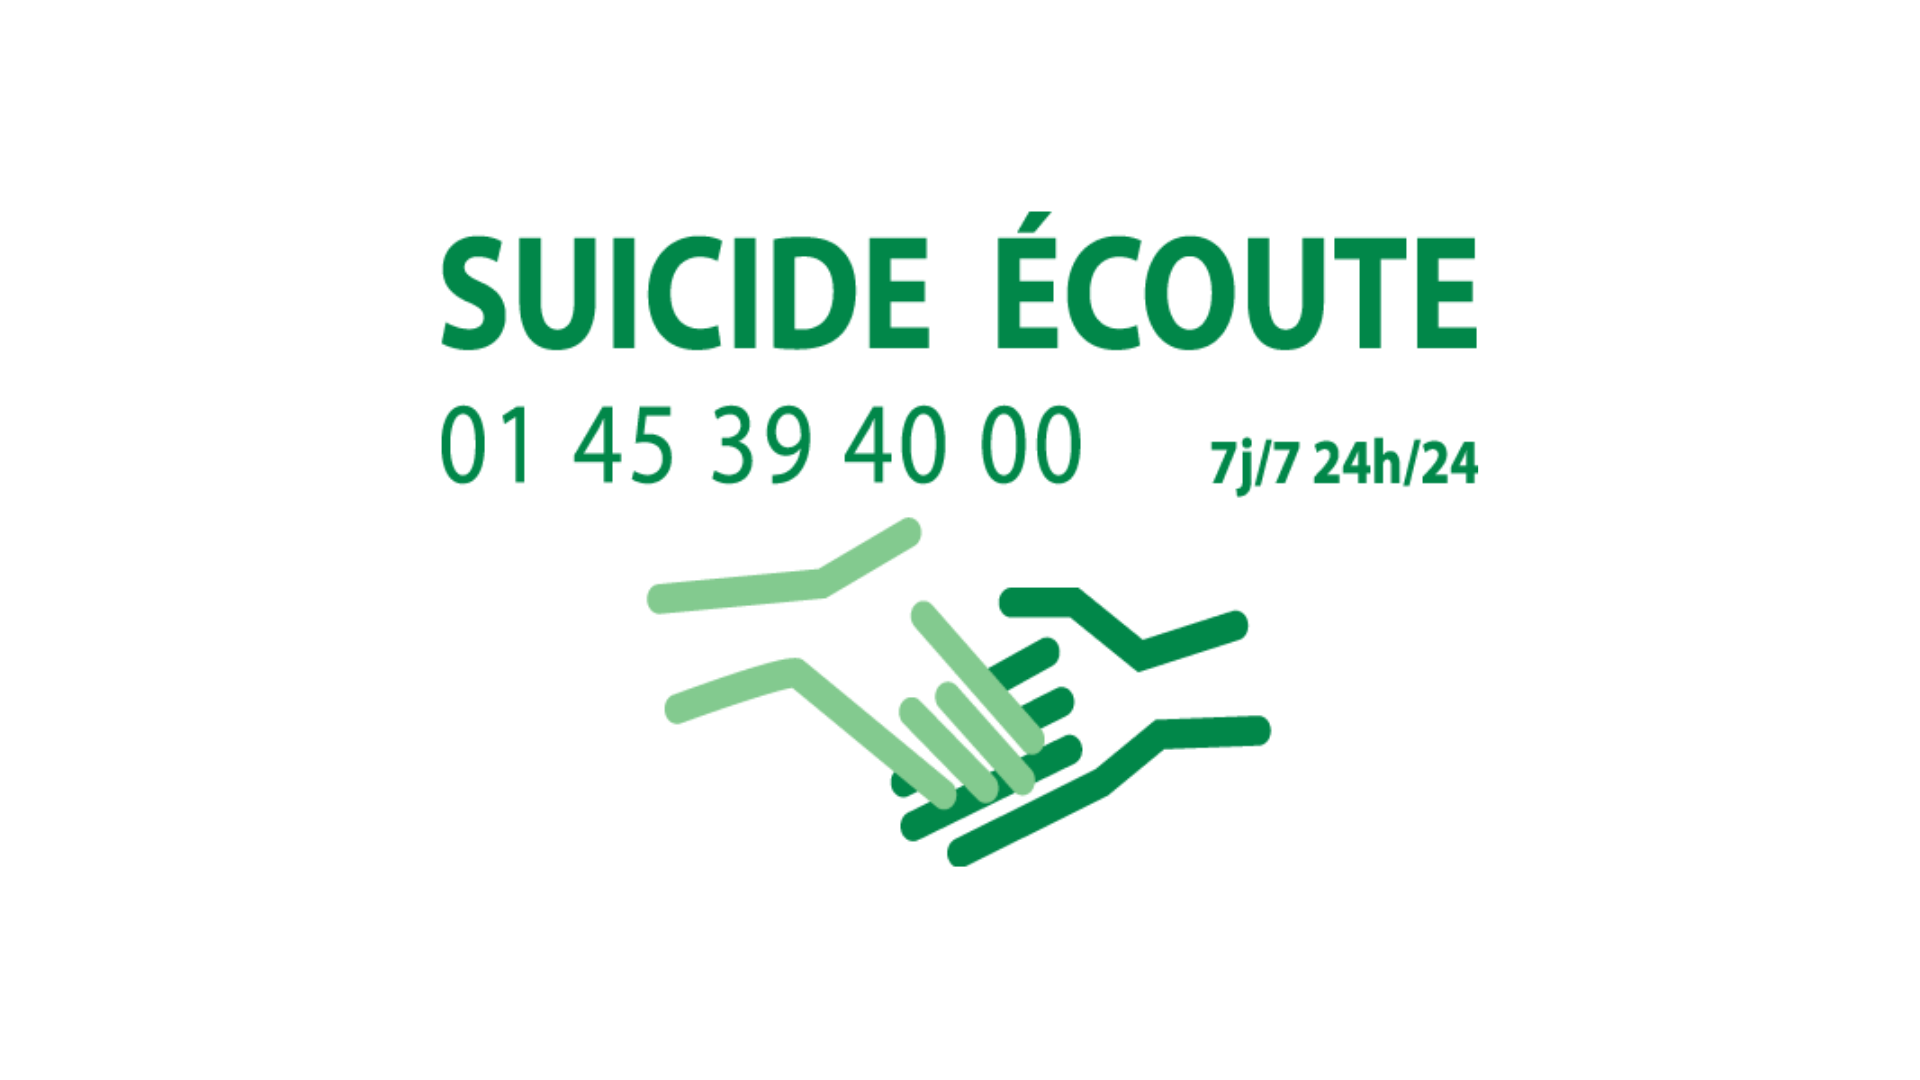 Suicide Ecoute france